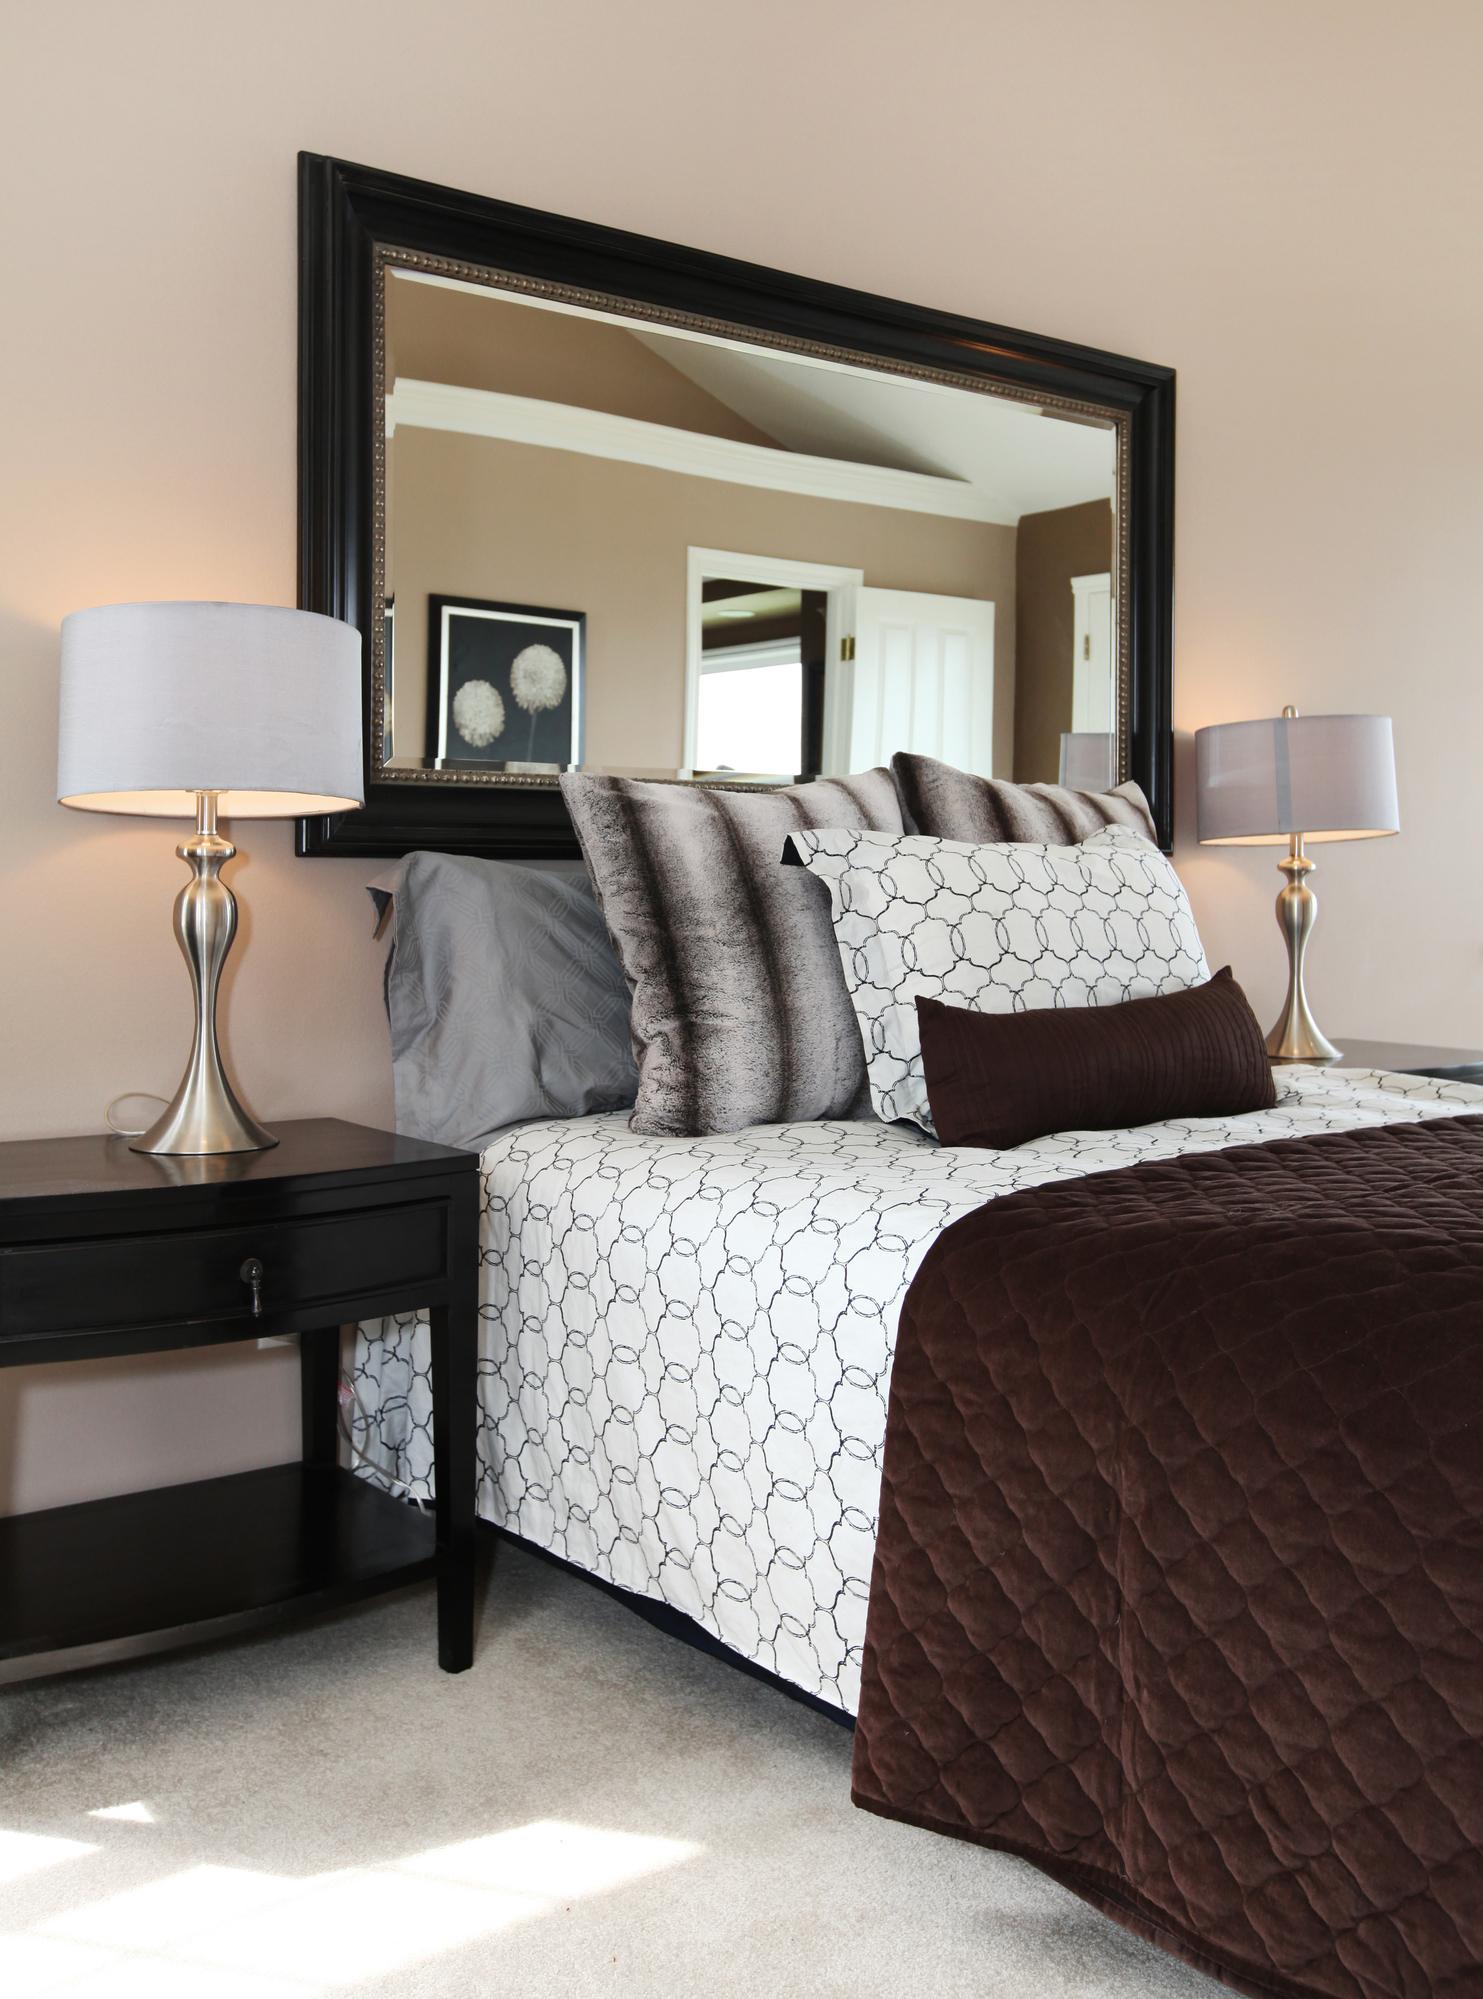 Anchorage, AK home furniture